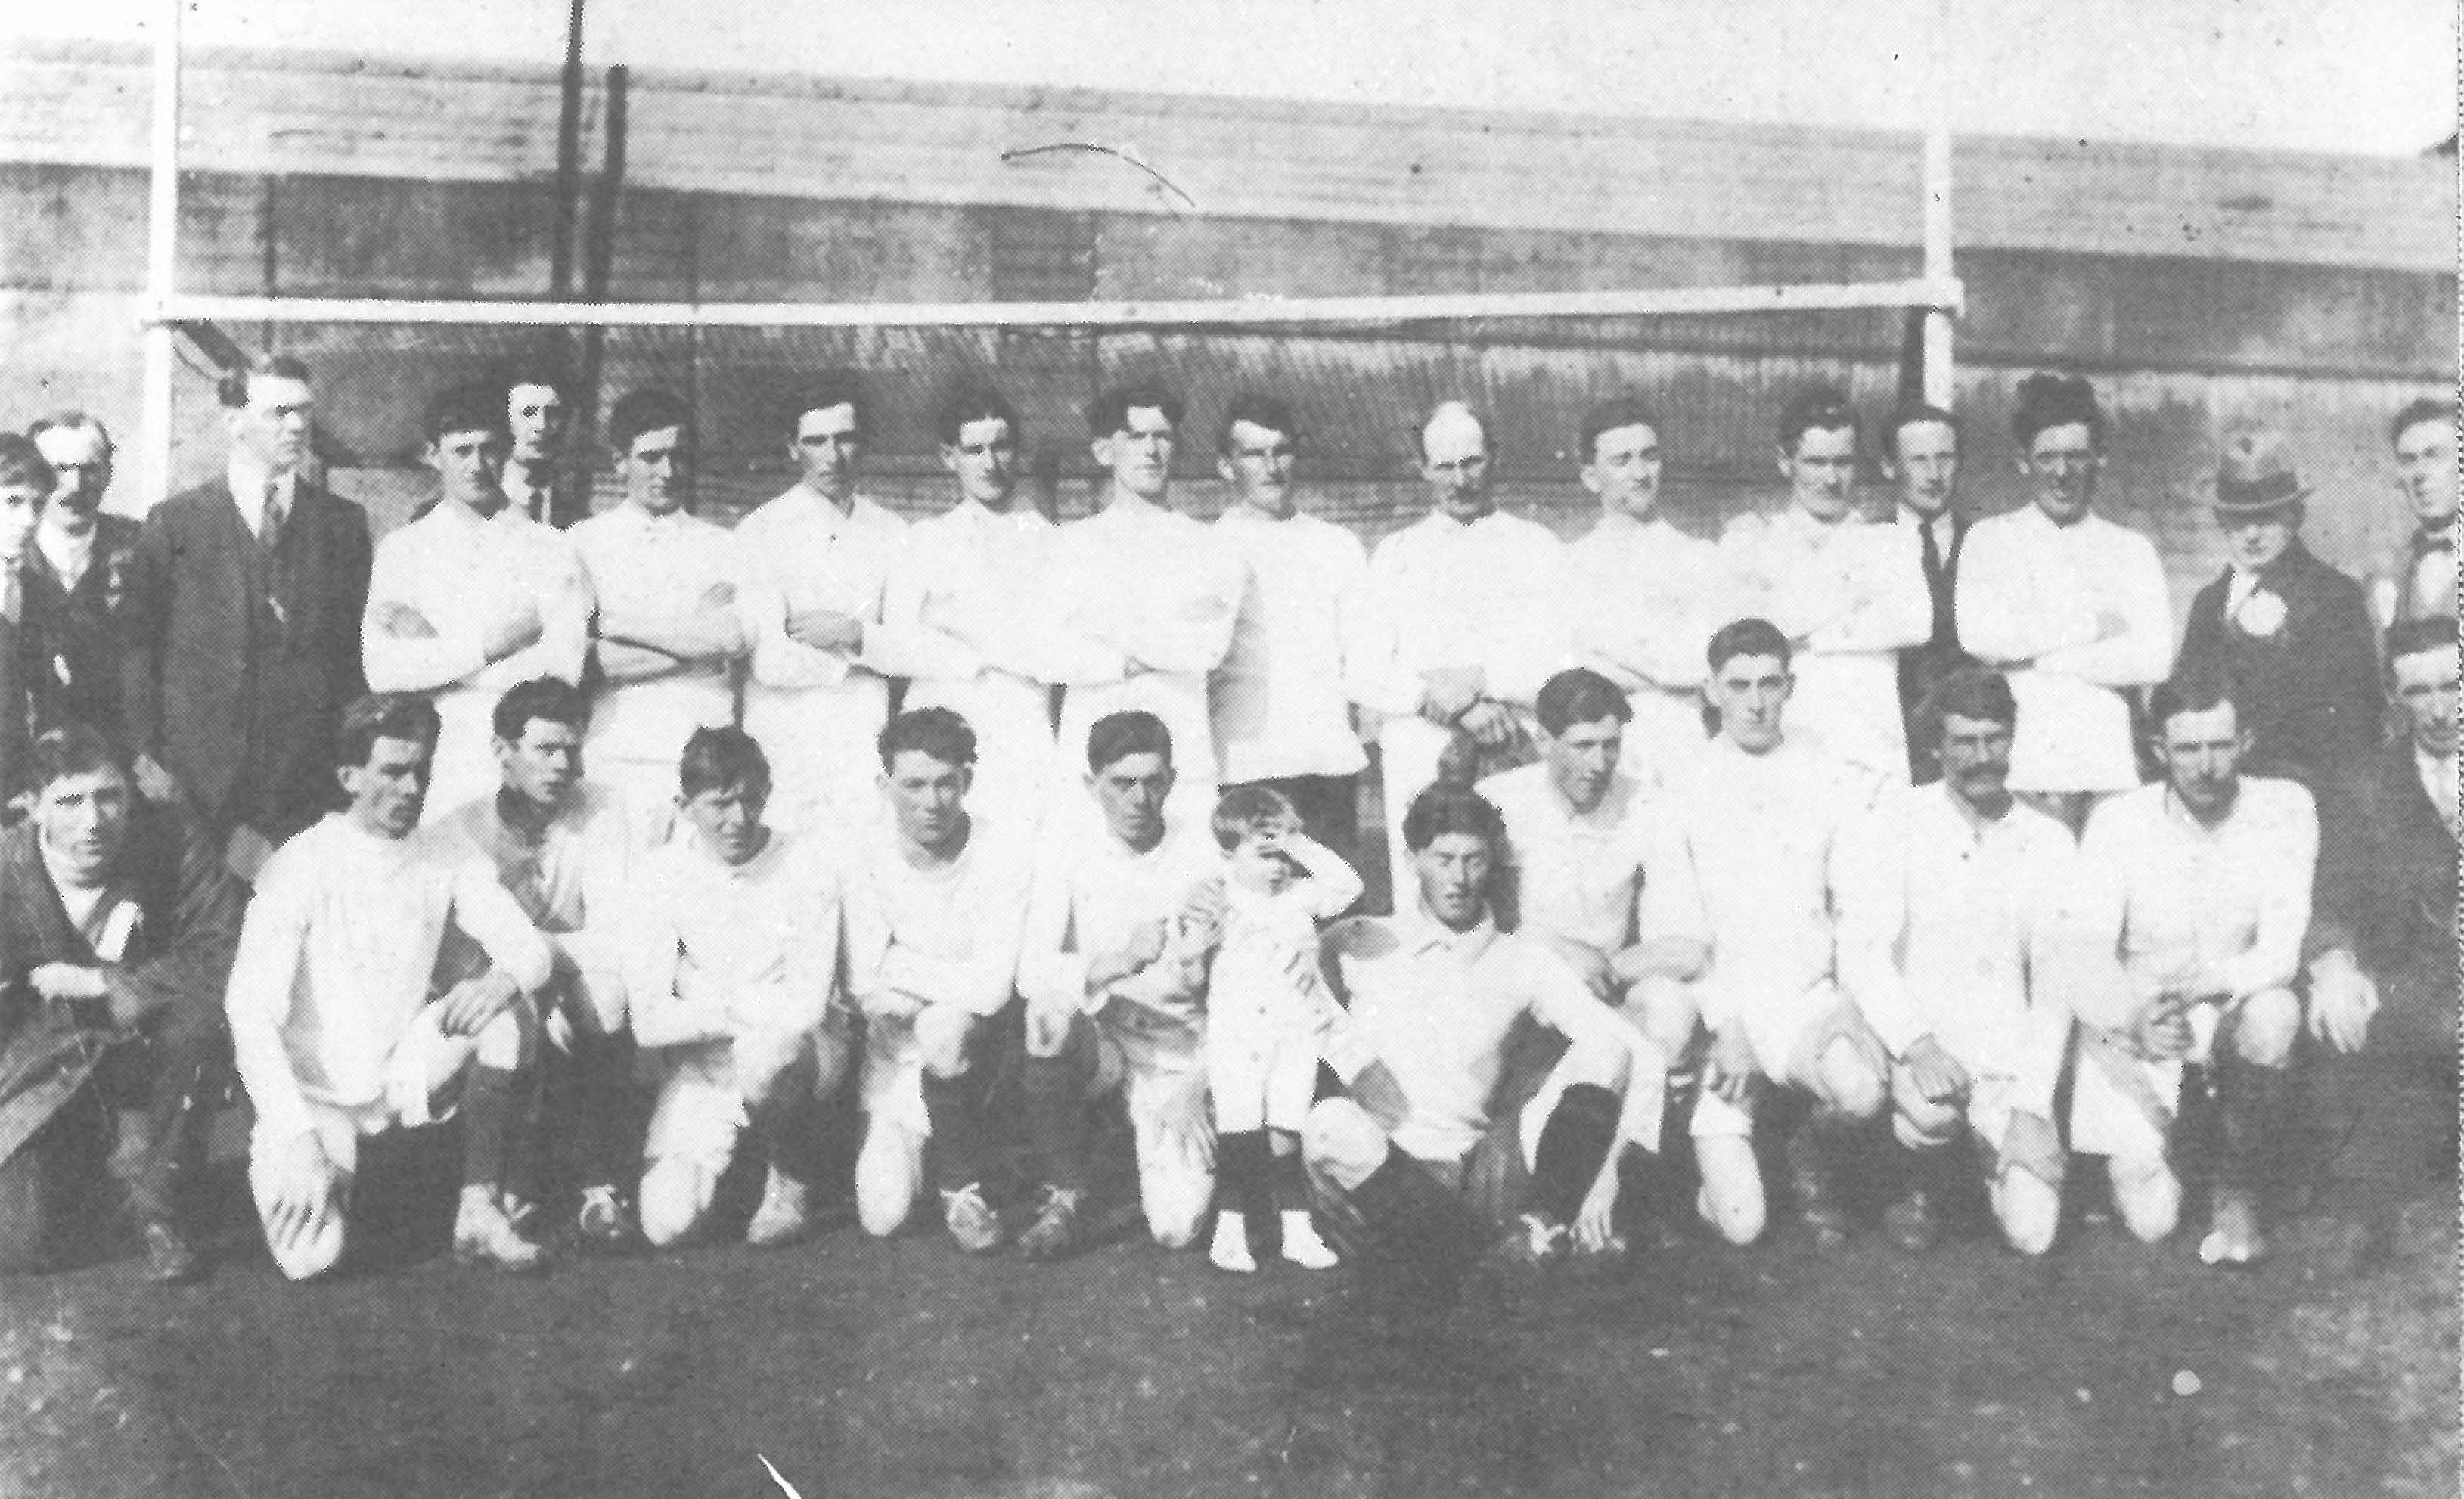 Kildare (Caragh) 1919 Football All-Ireland Champions